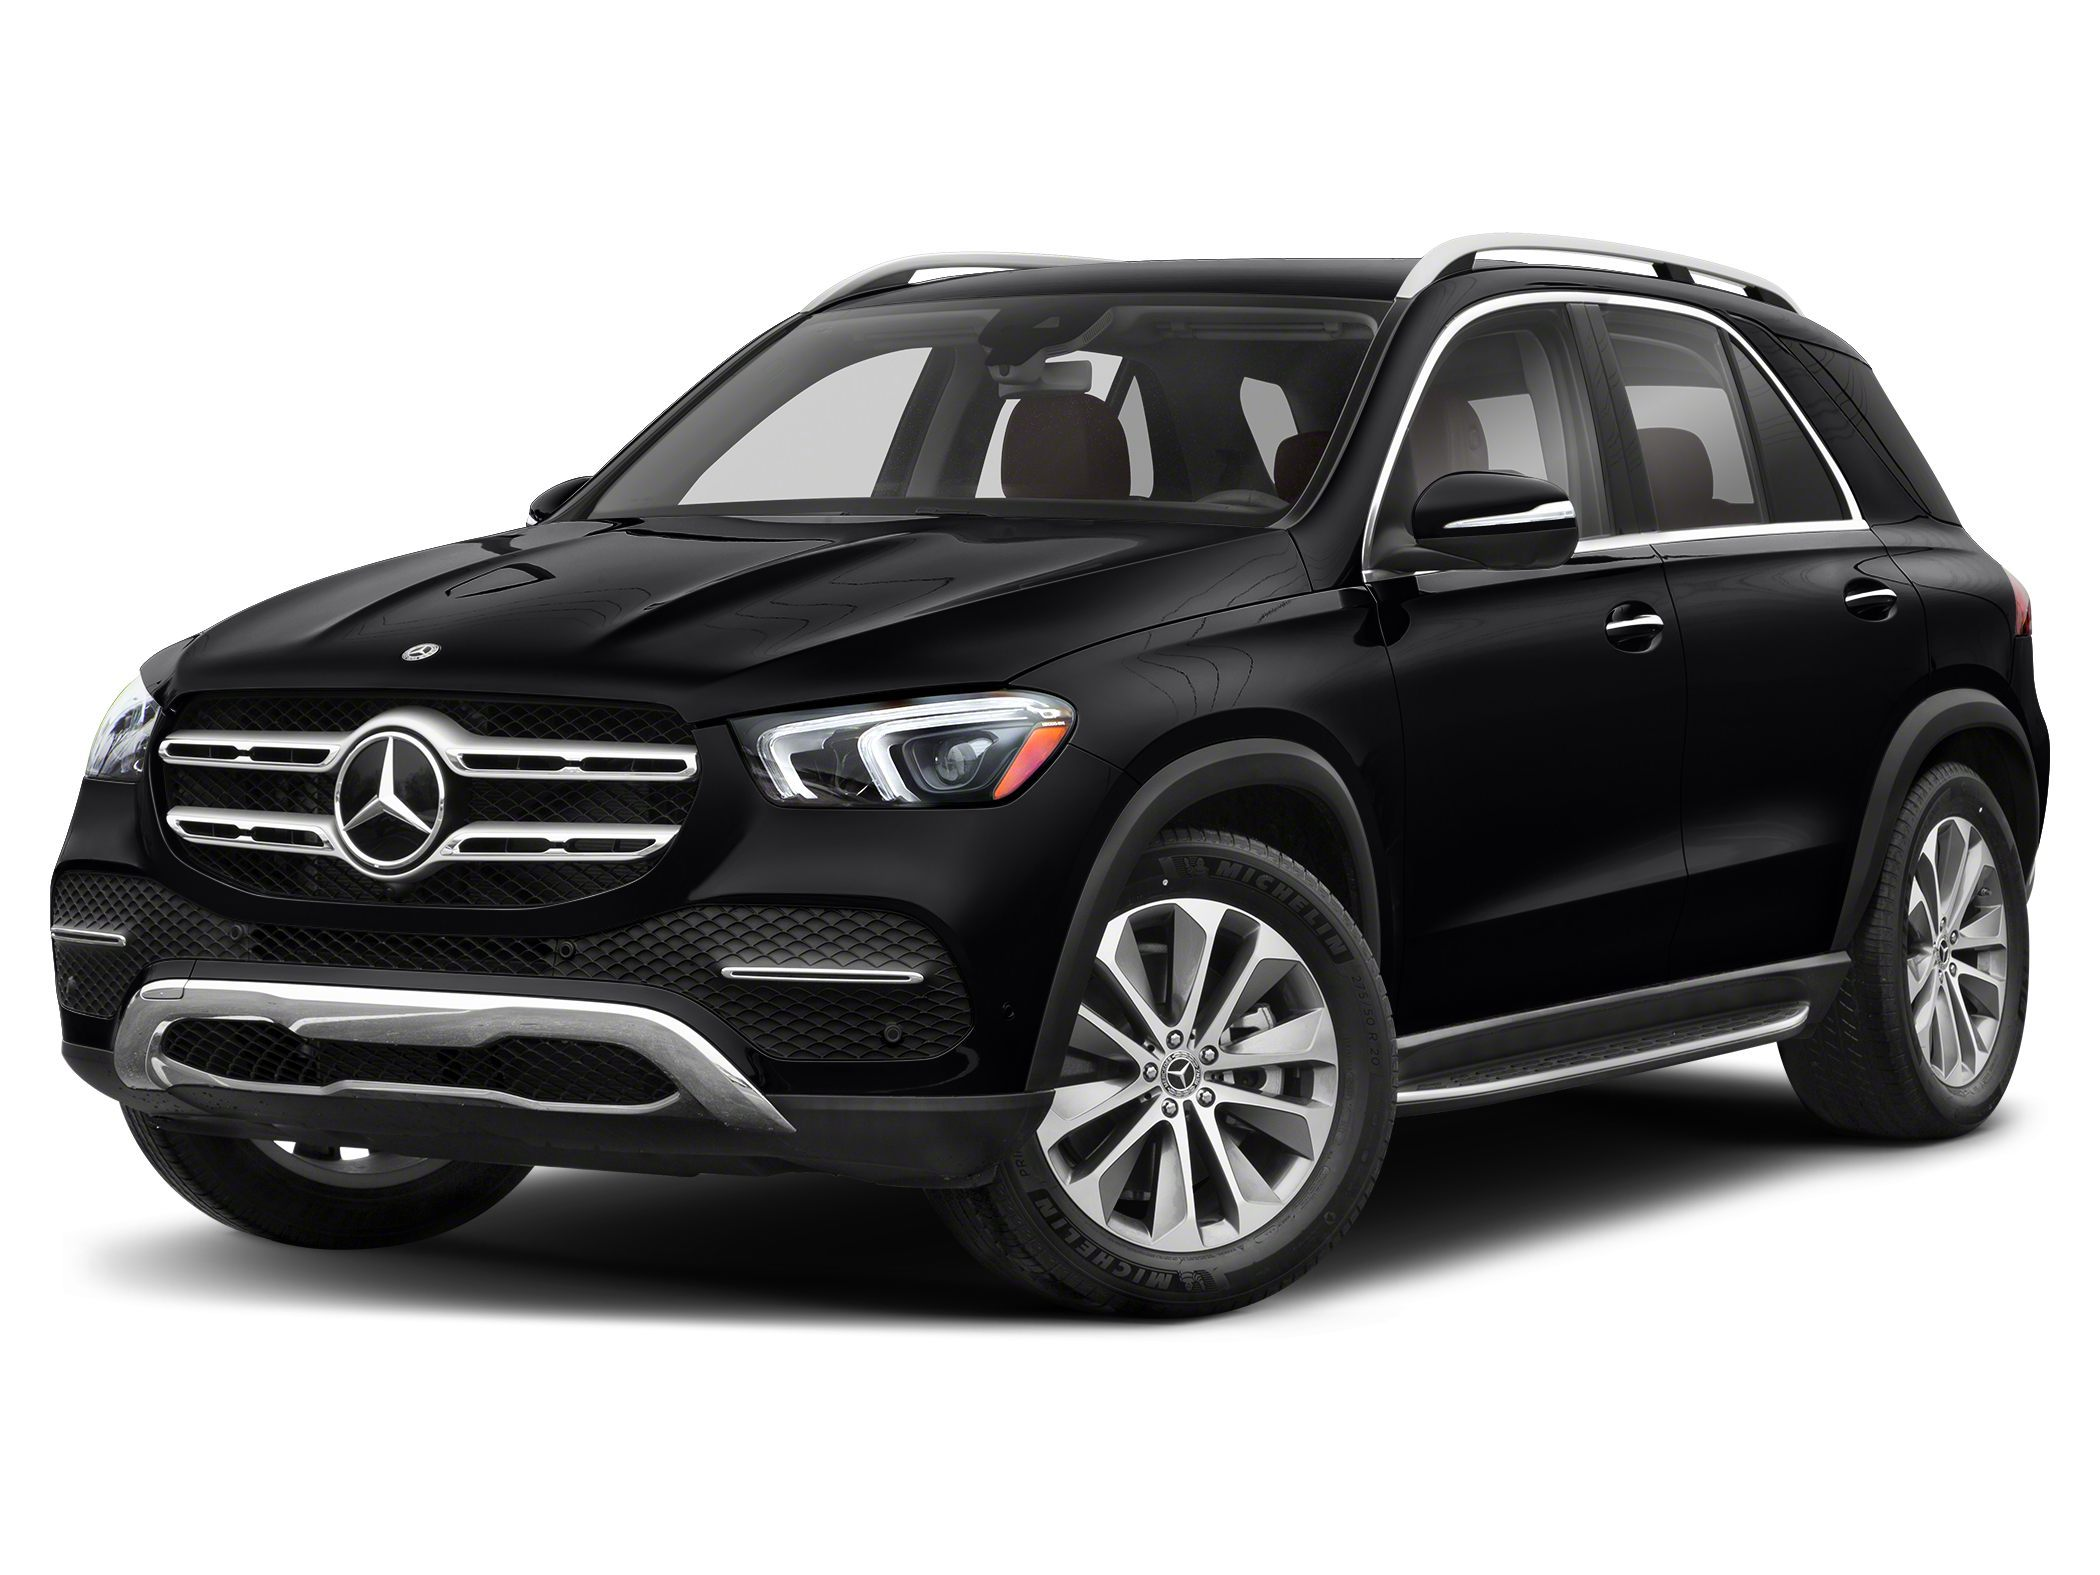 2022 Mercedes-Benz GLE 450 SUV